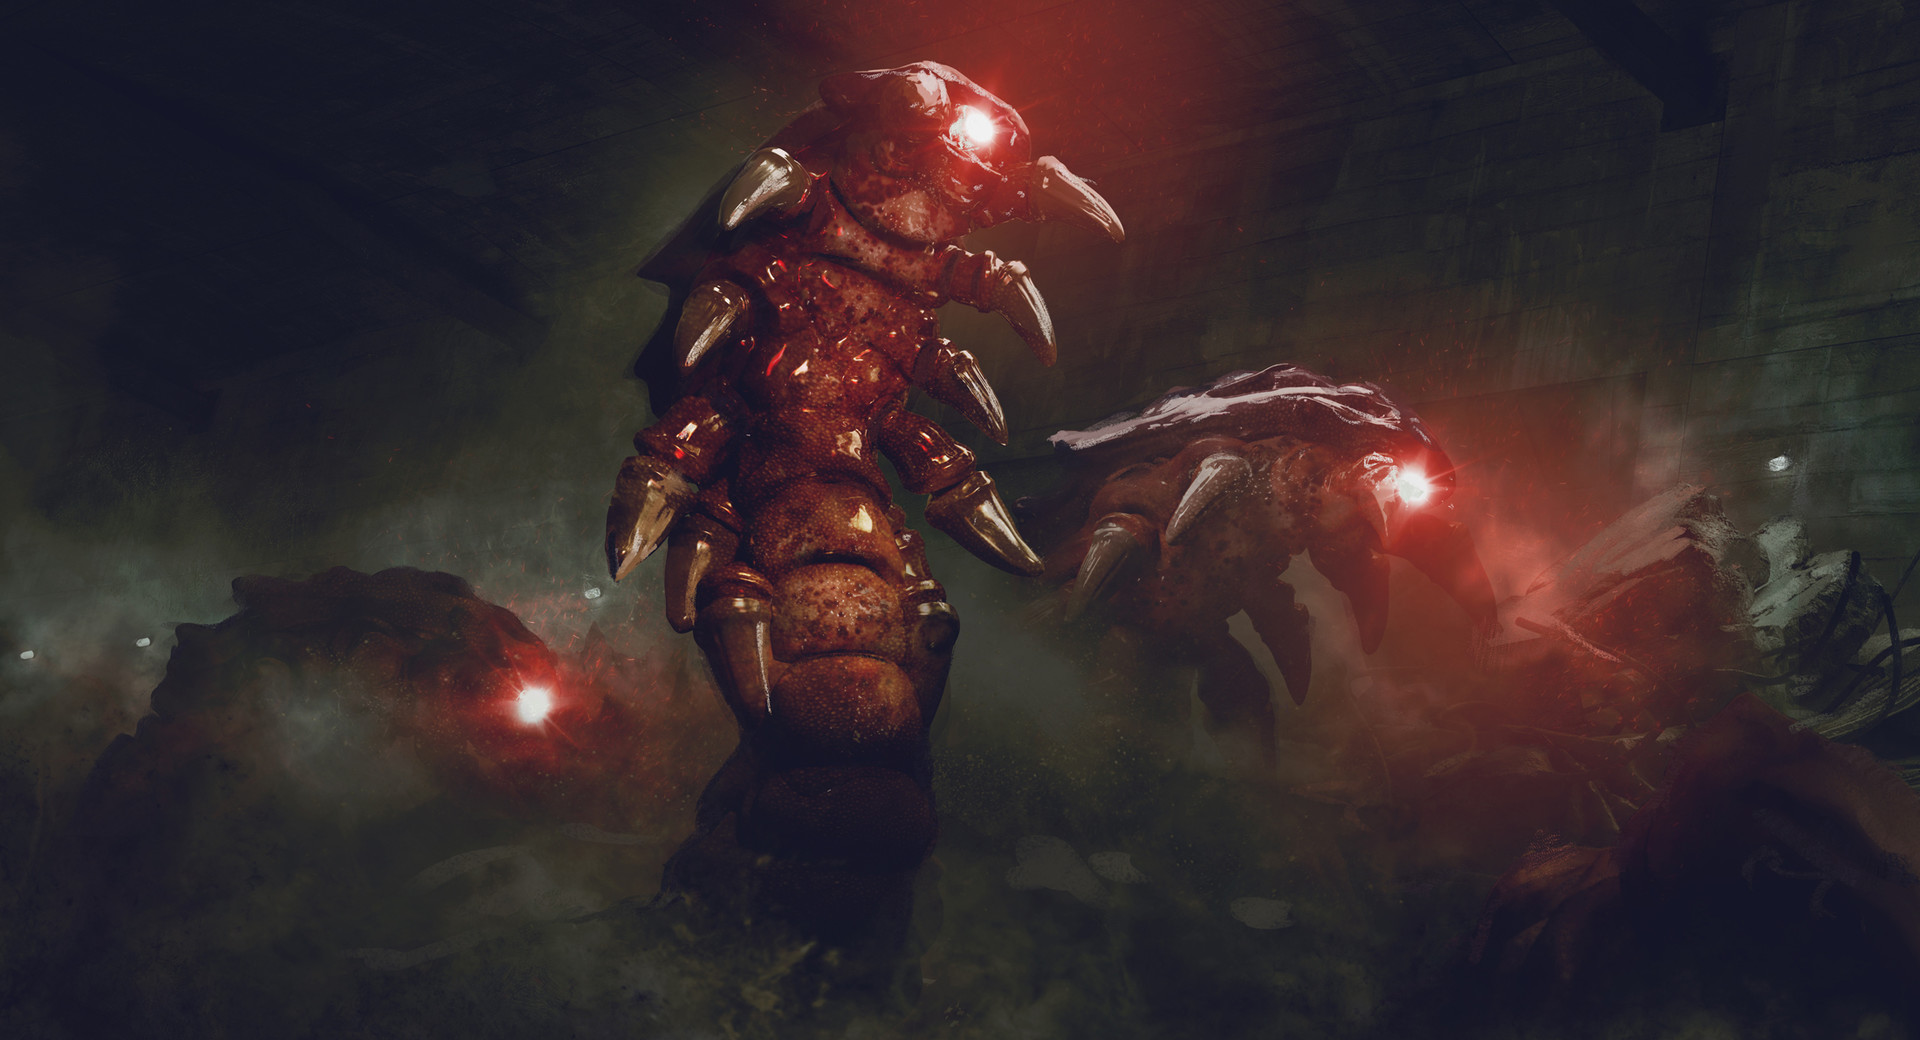 Guillem h pongiluppi 29 alien race small